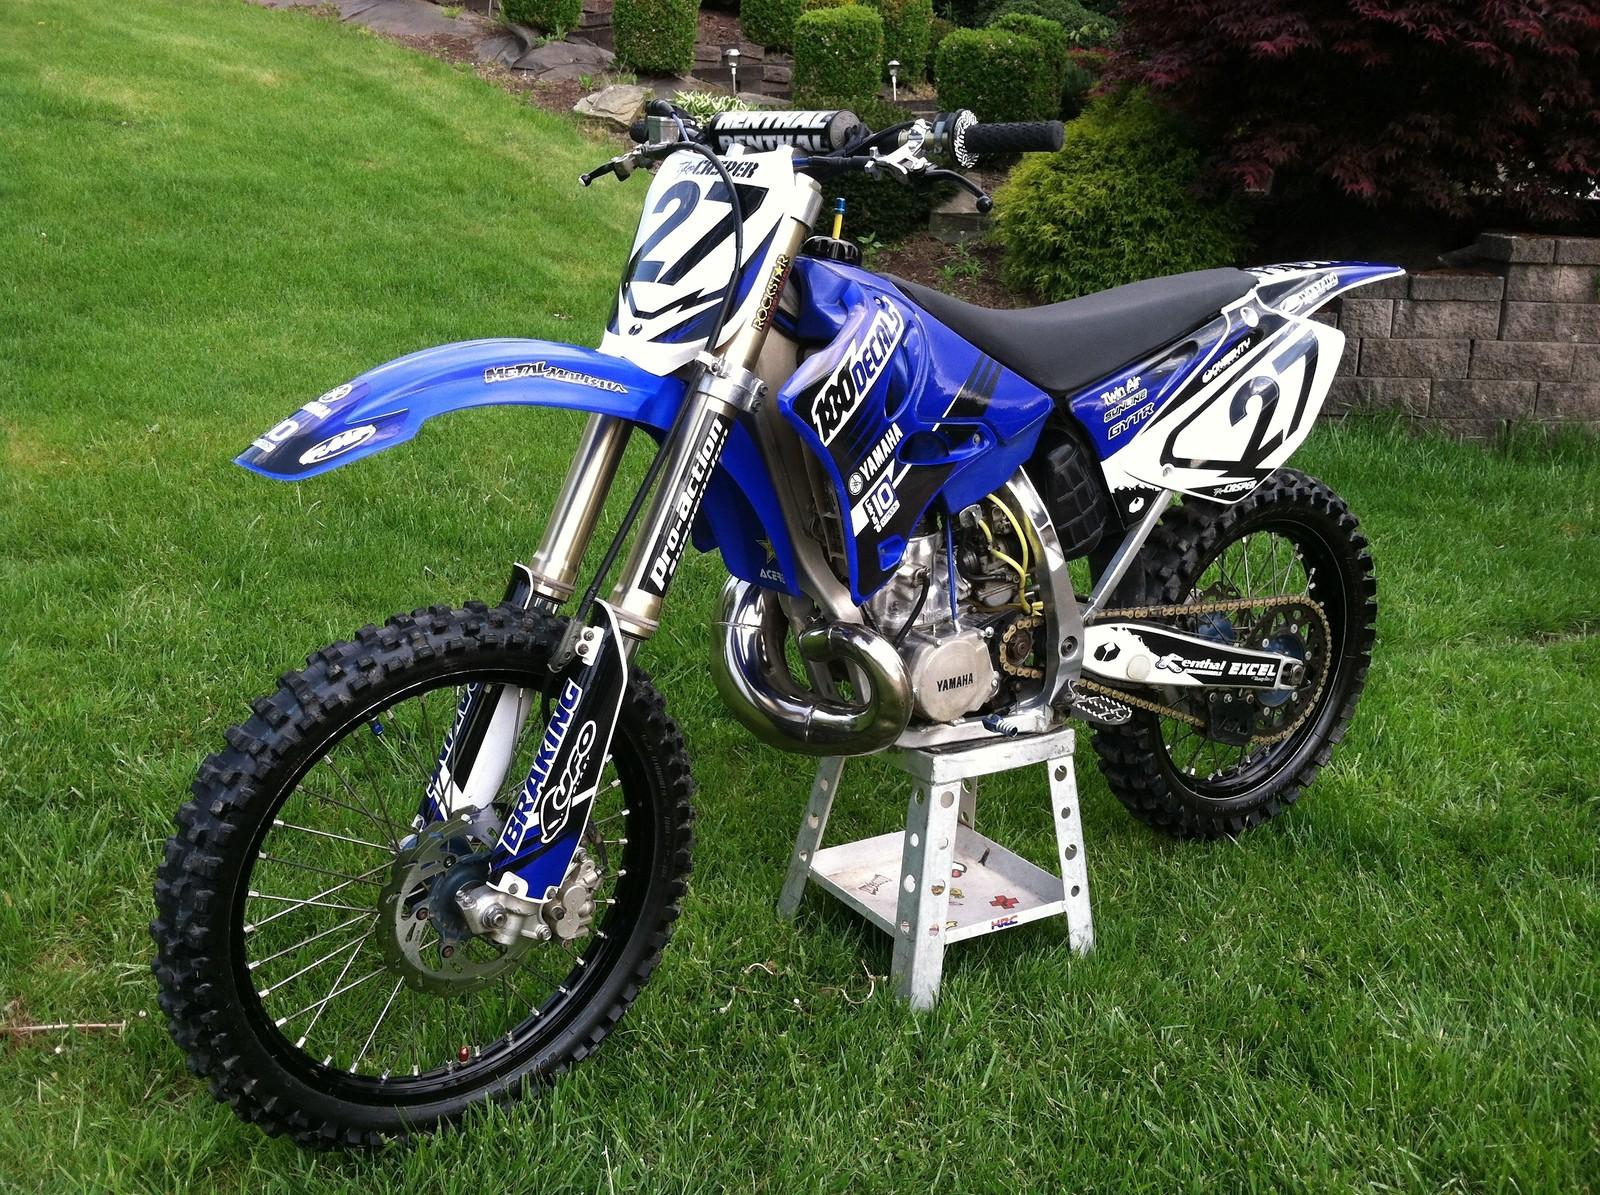 2005 yz 250 2 stroke tyler casper 27 39 s bike check for Yamaha yz250 2 stroke